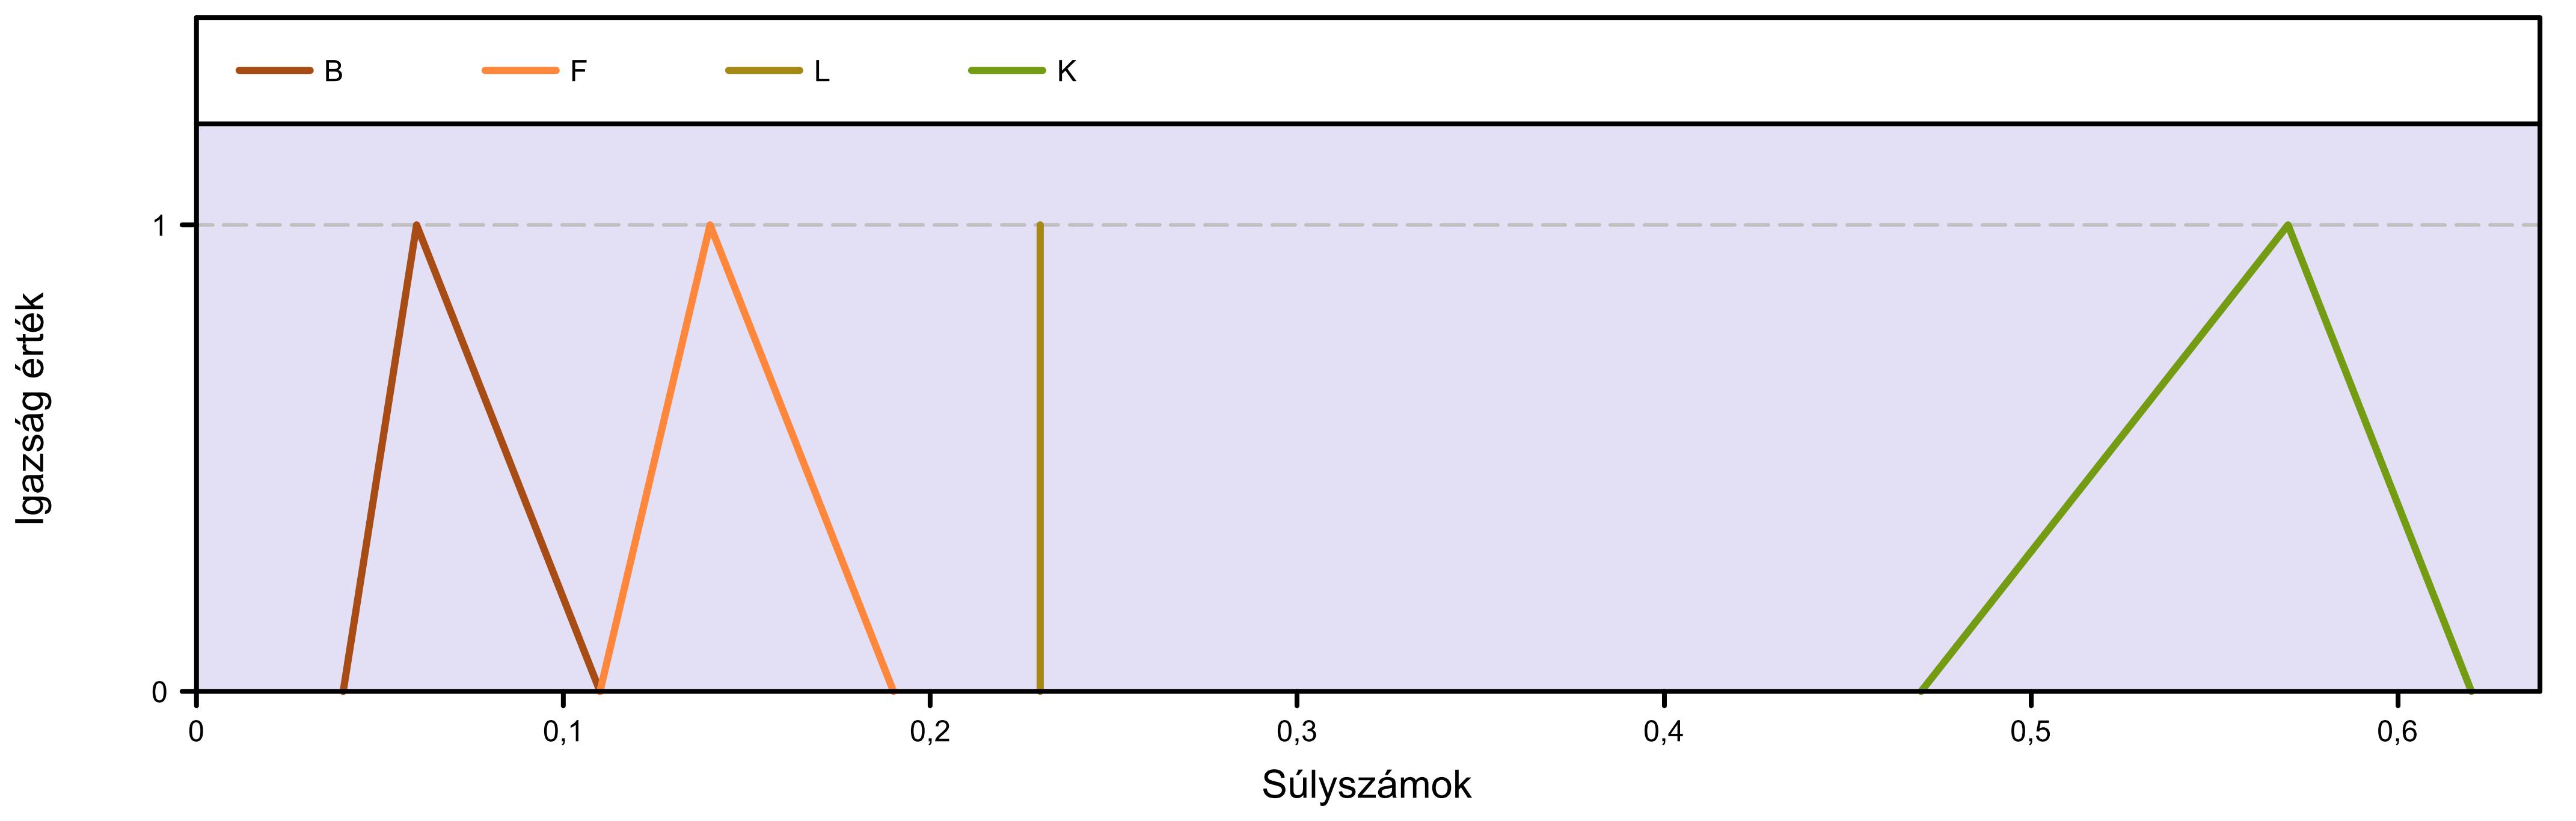 Gulyas_07_ul